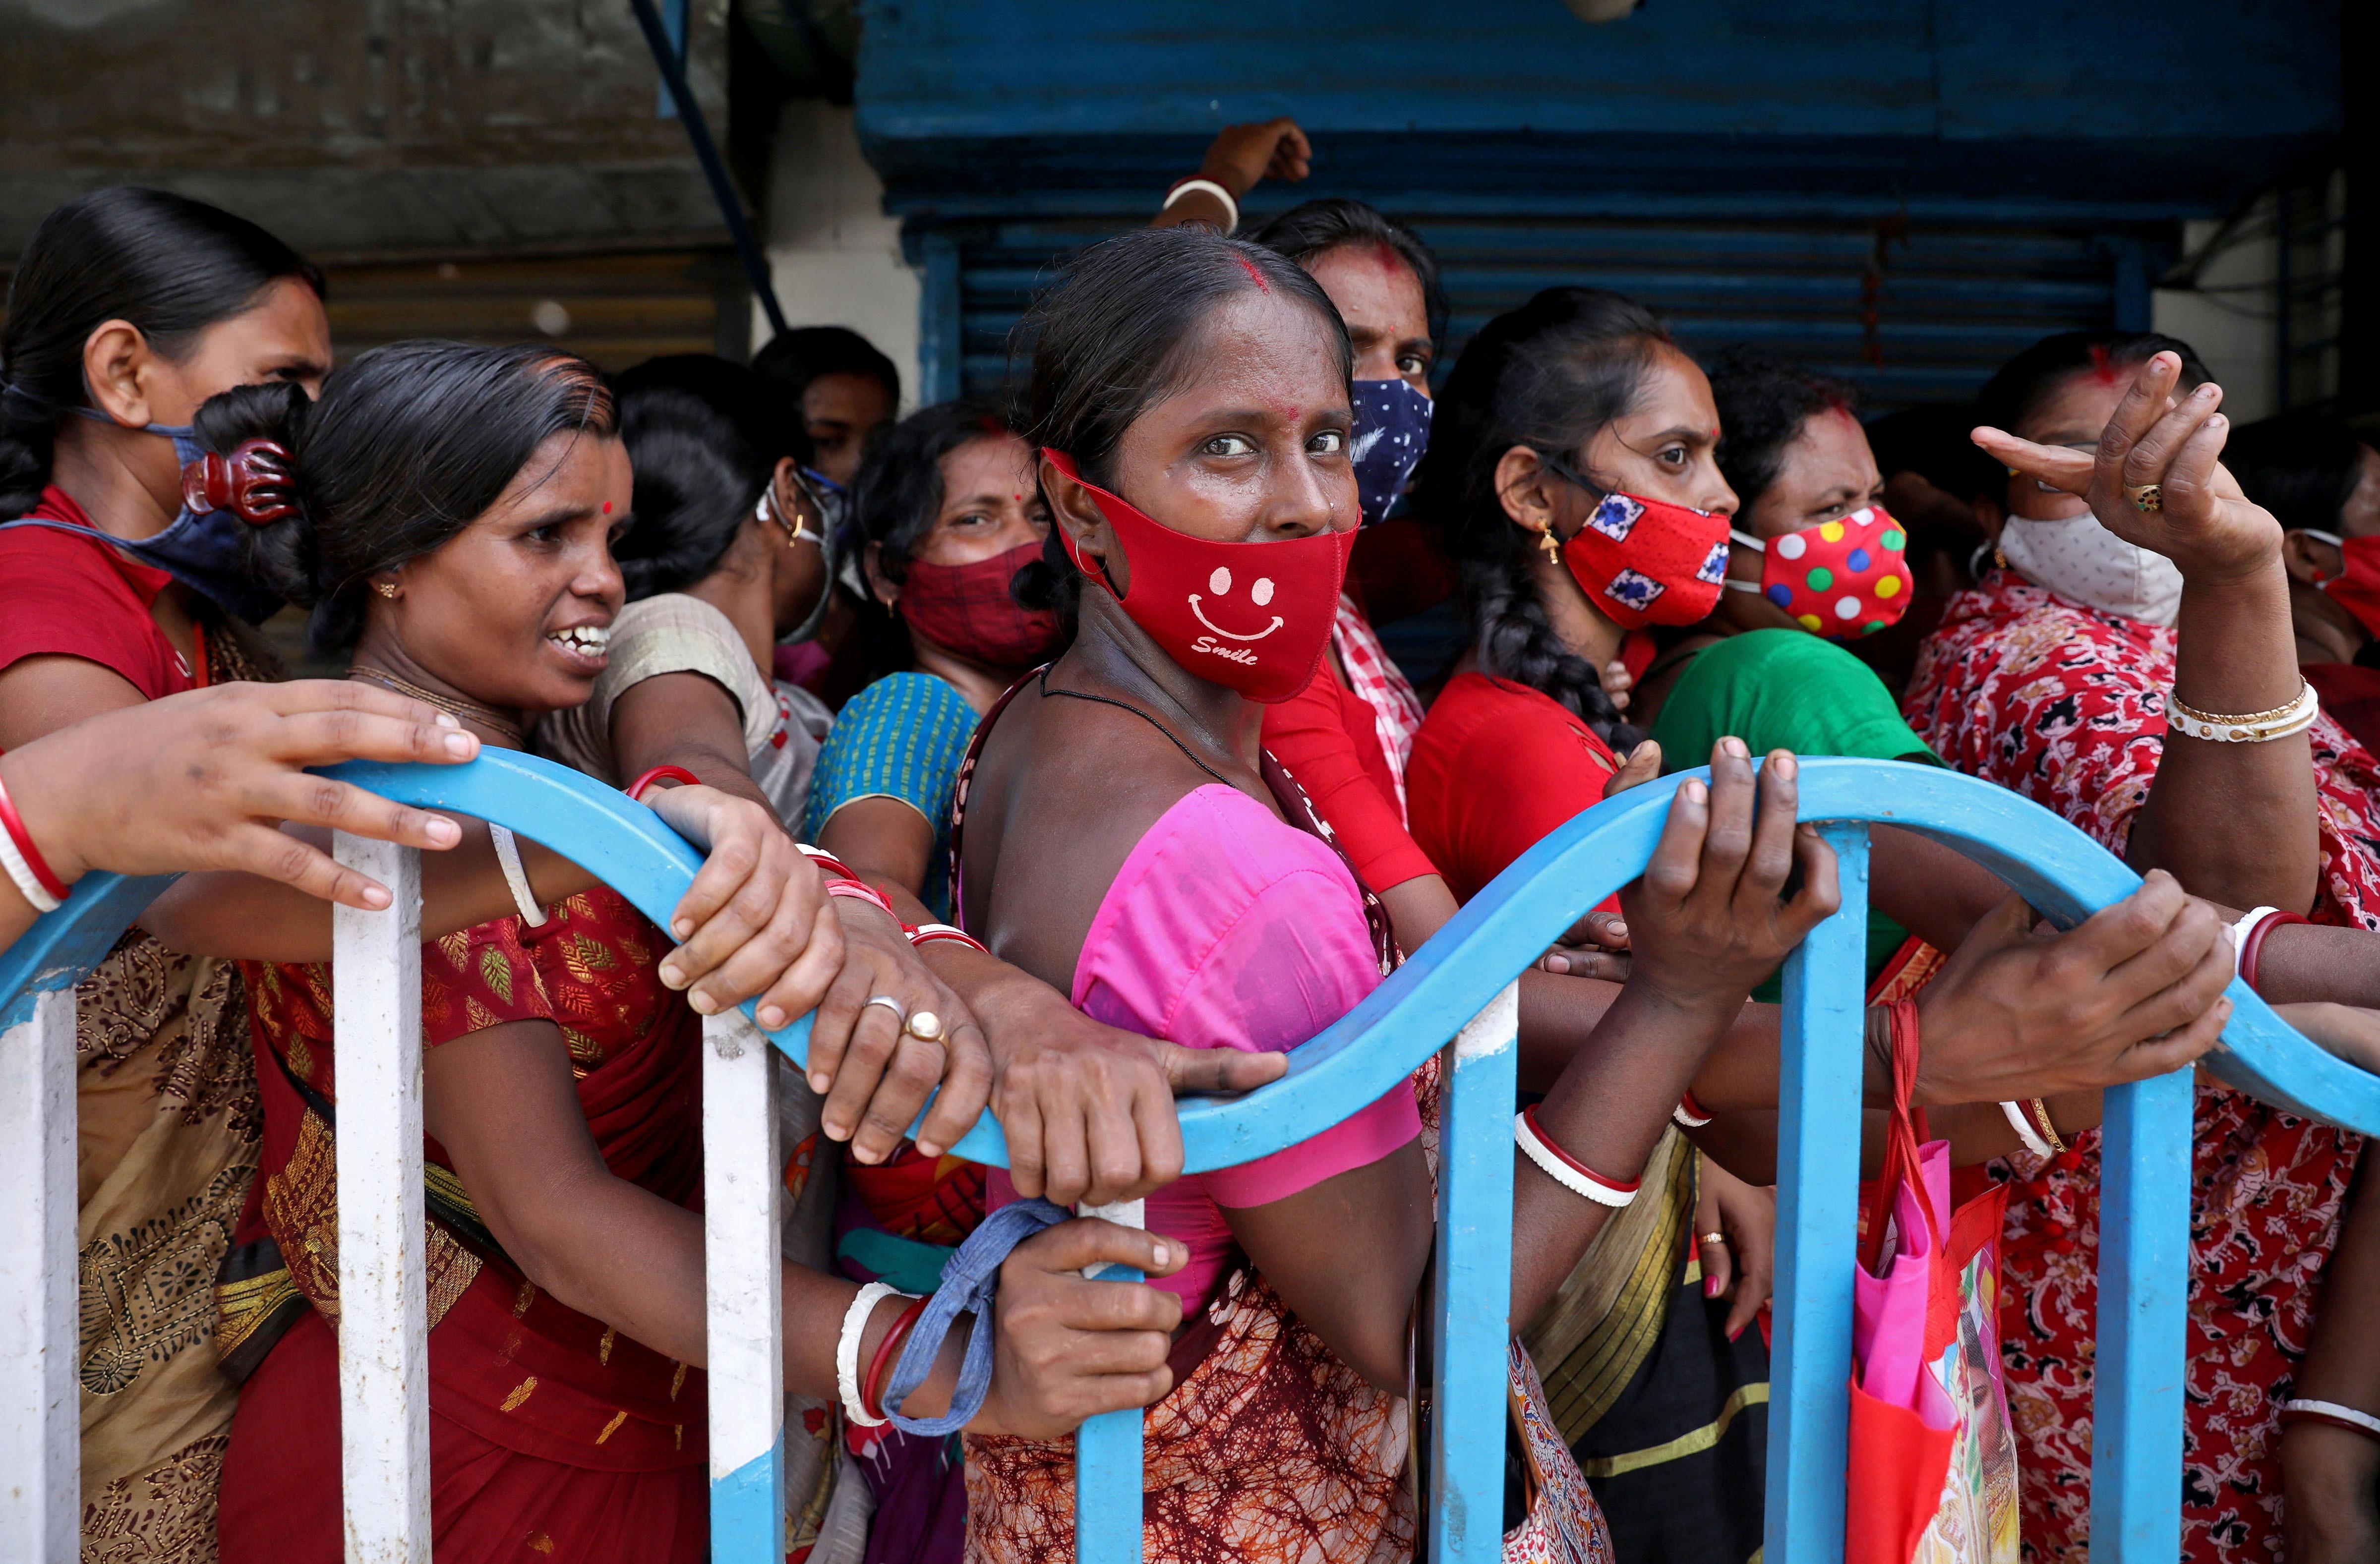 Women wait to receive a dose of COVISHIELD vaccine, a coronavirus disease (COVID-19) vaccine manufactured by Serum Institute of India, outside a vaccination centre in Kolkata, India, August 31, 2021. REUTERS/Rupak De Chowdhuri - RC25GP99DAFC